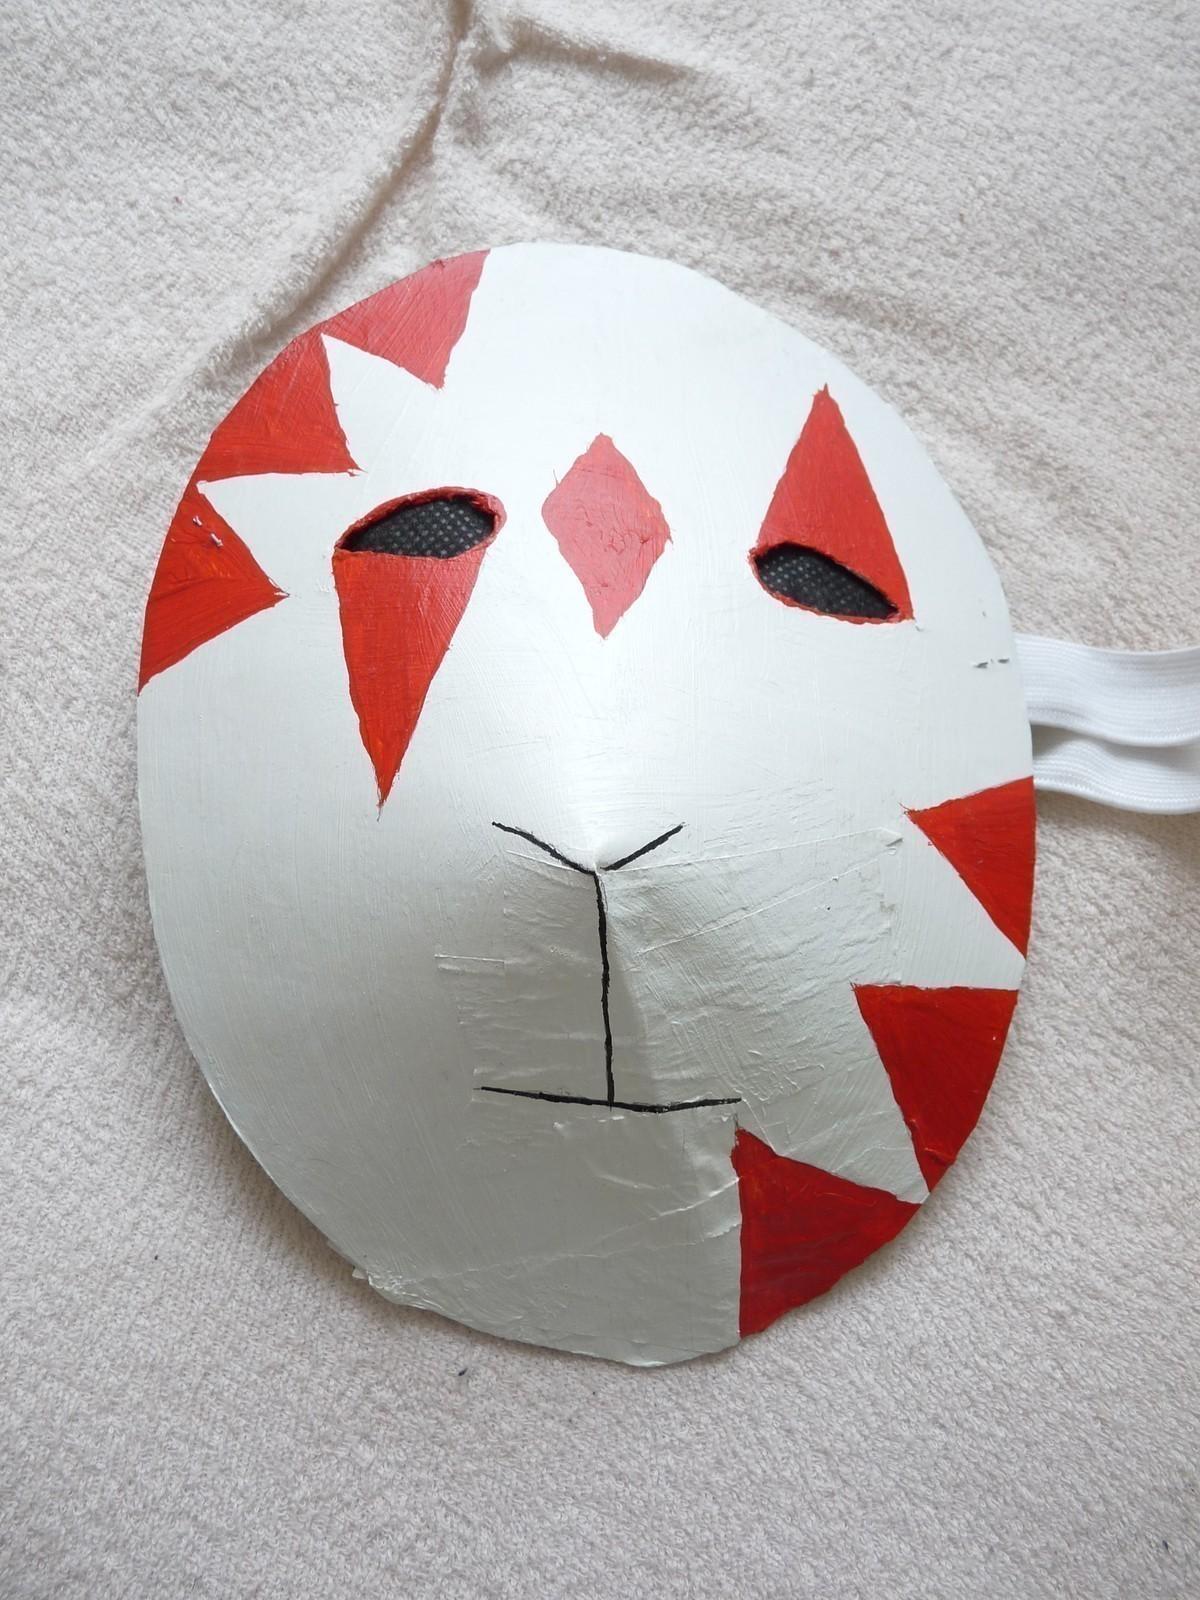 Anbu Masks From Naruto  A Mask  Papercraft and